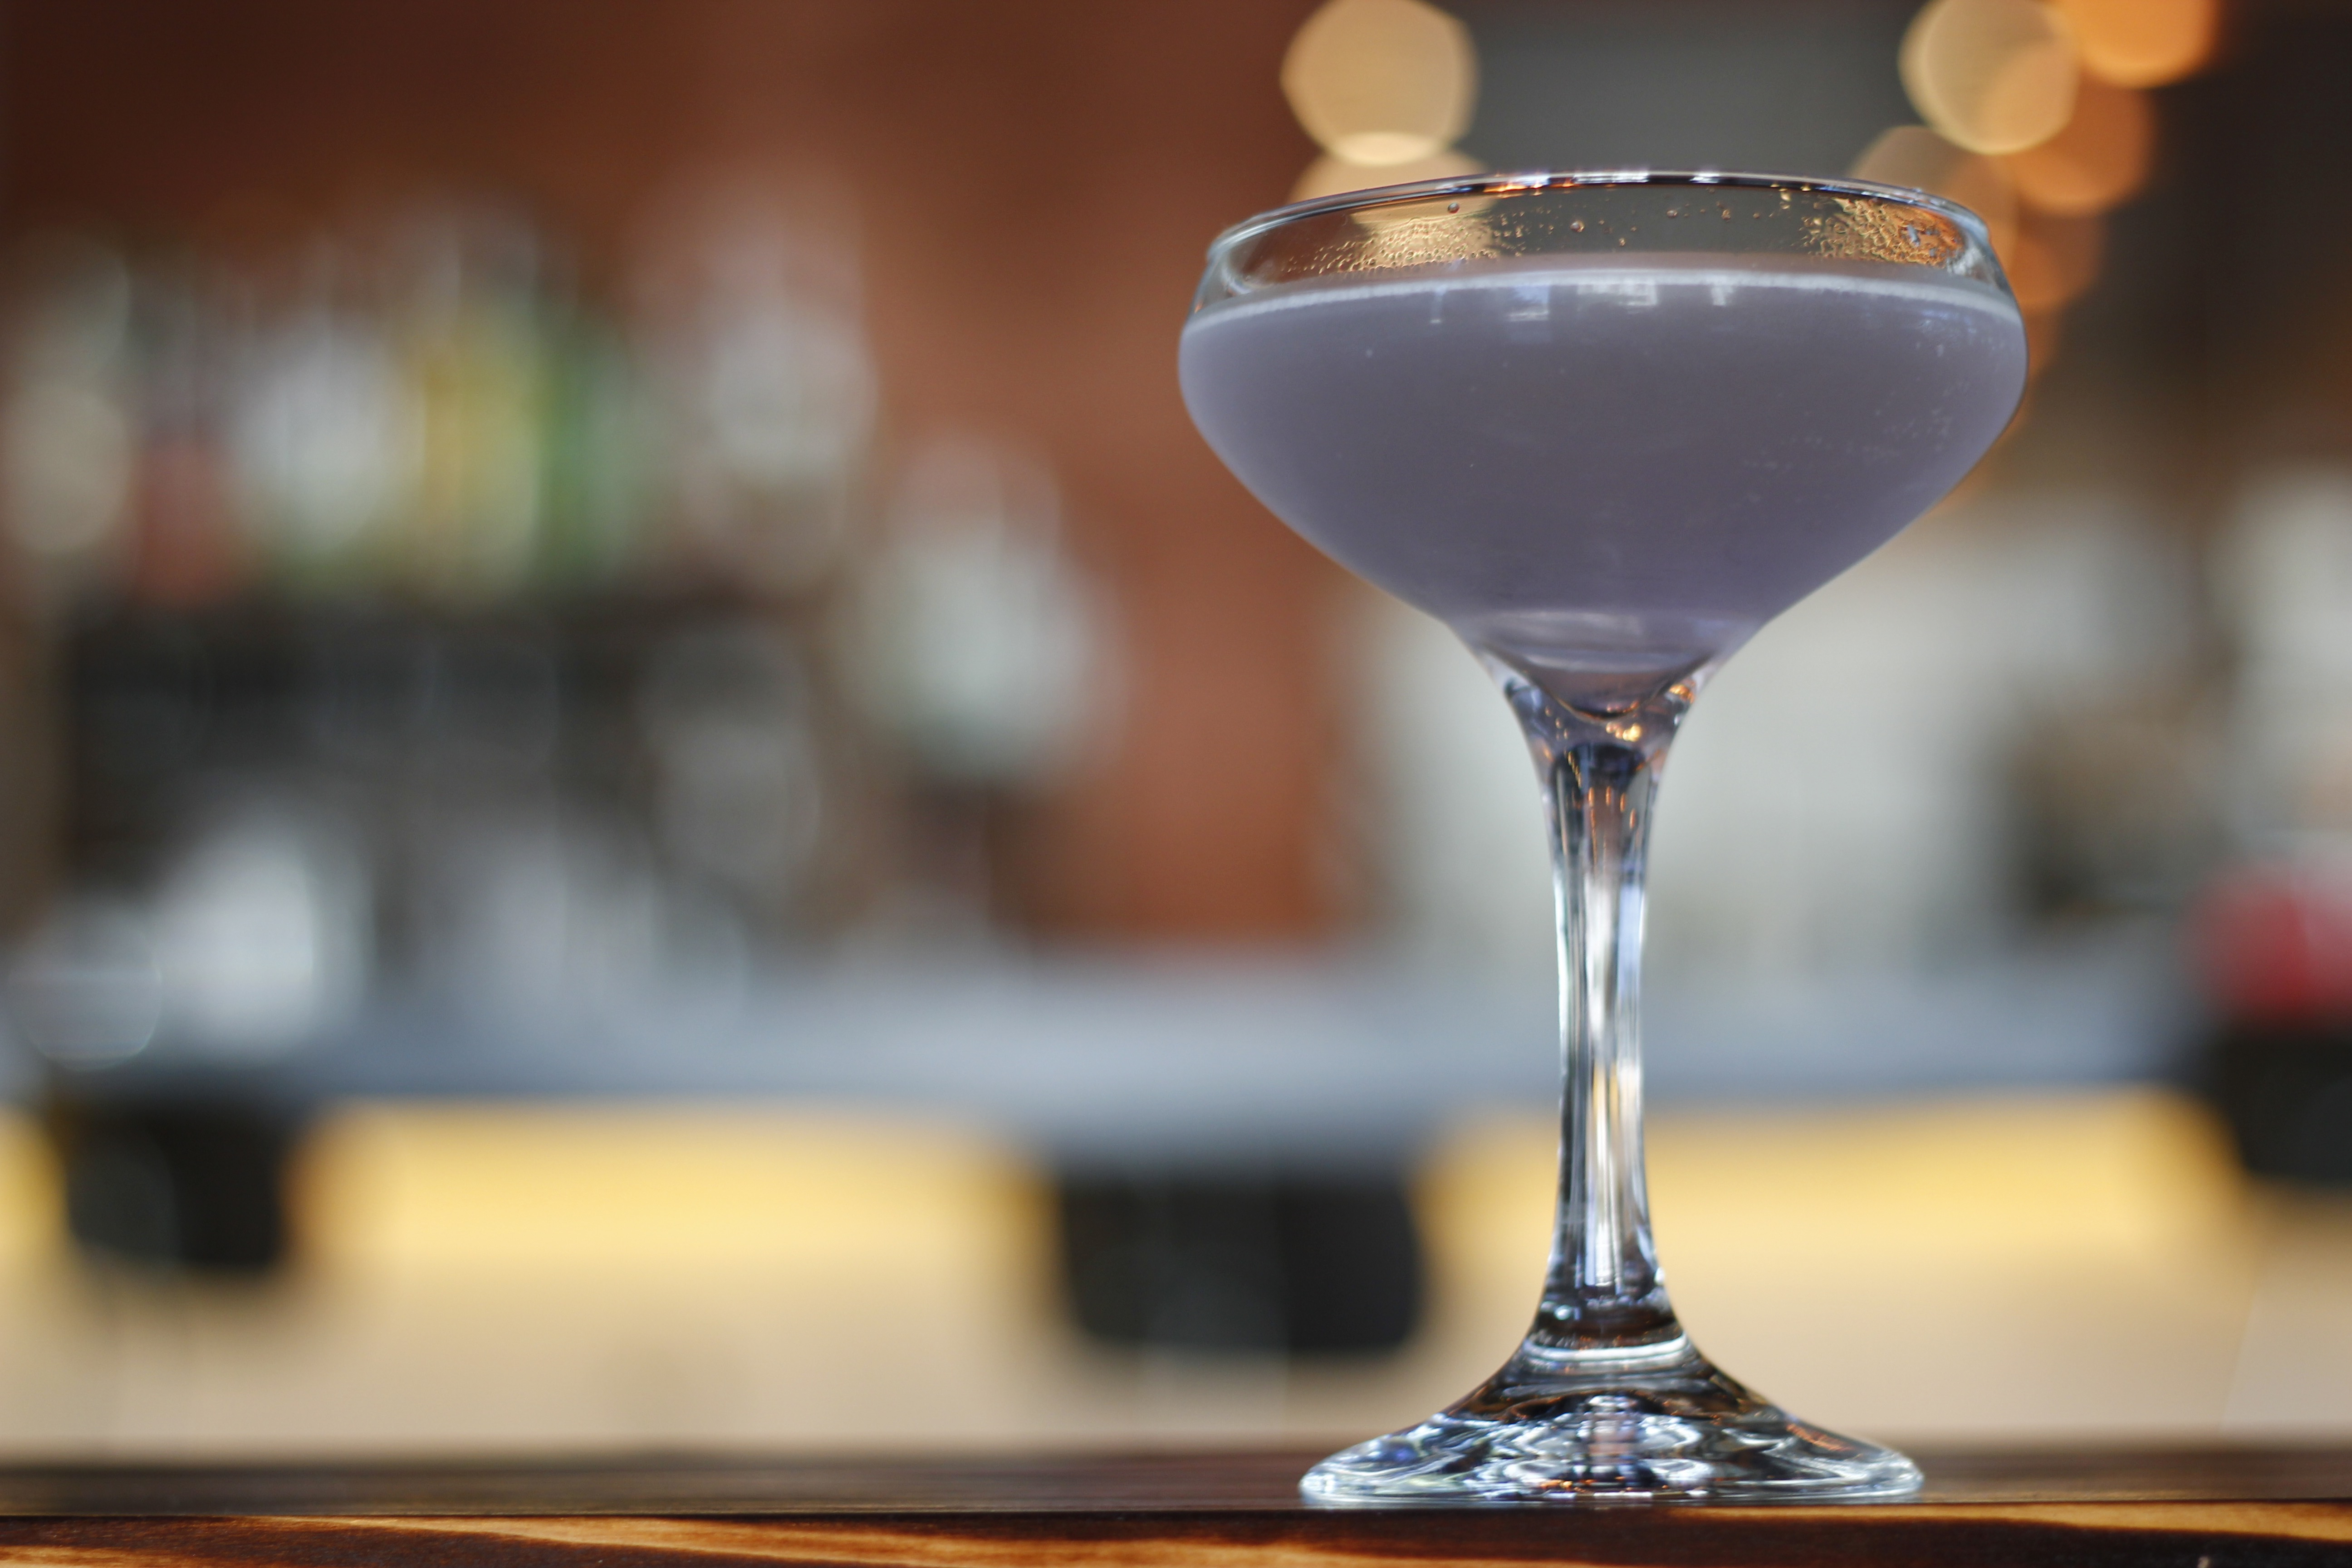 Sagittarius cocktail at Ursa Major